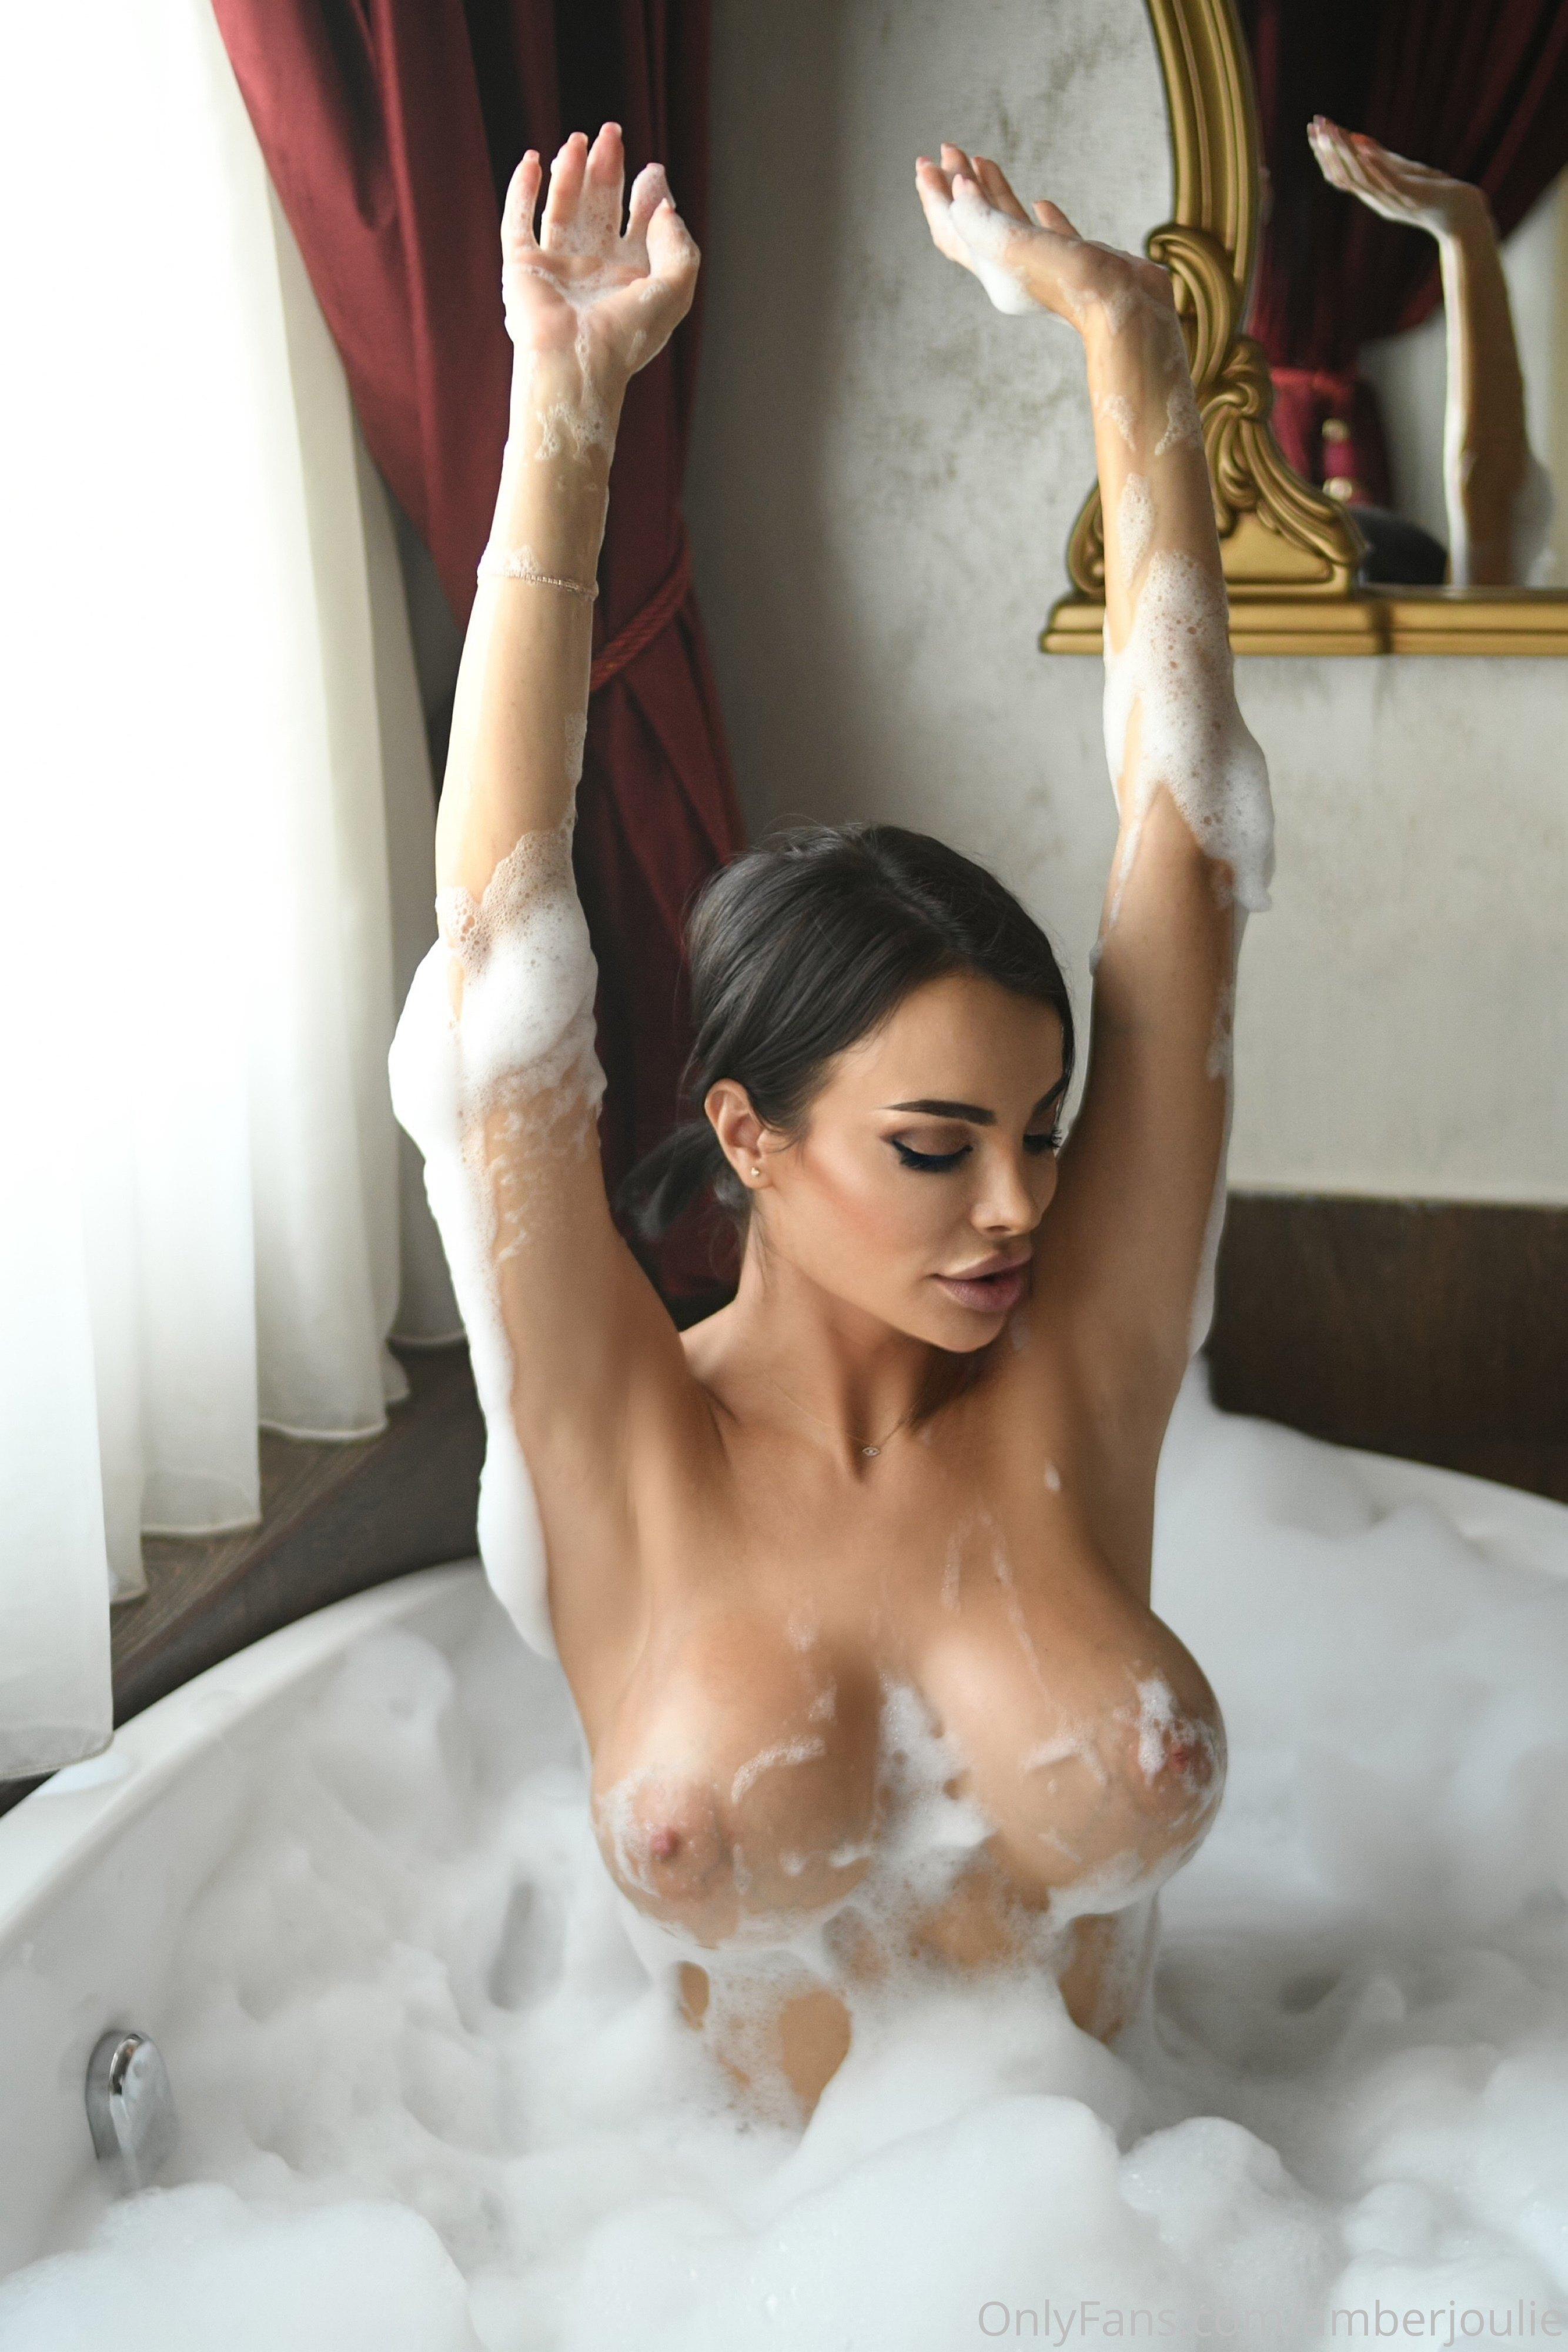 @amberjoulie nude photo 34